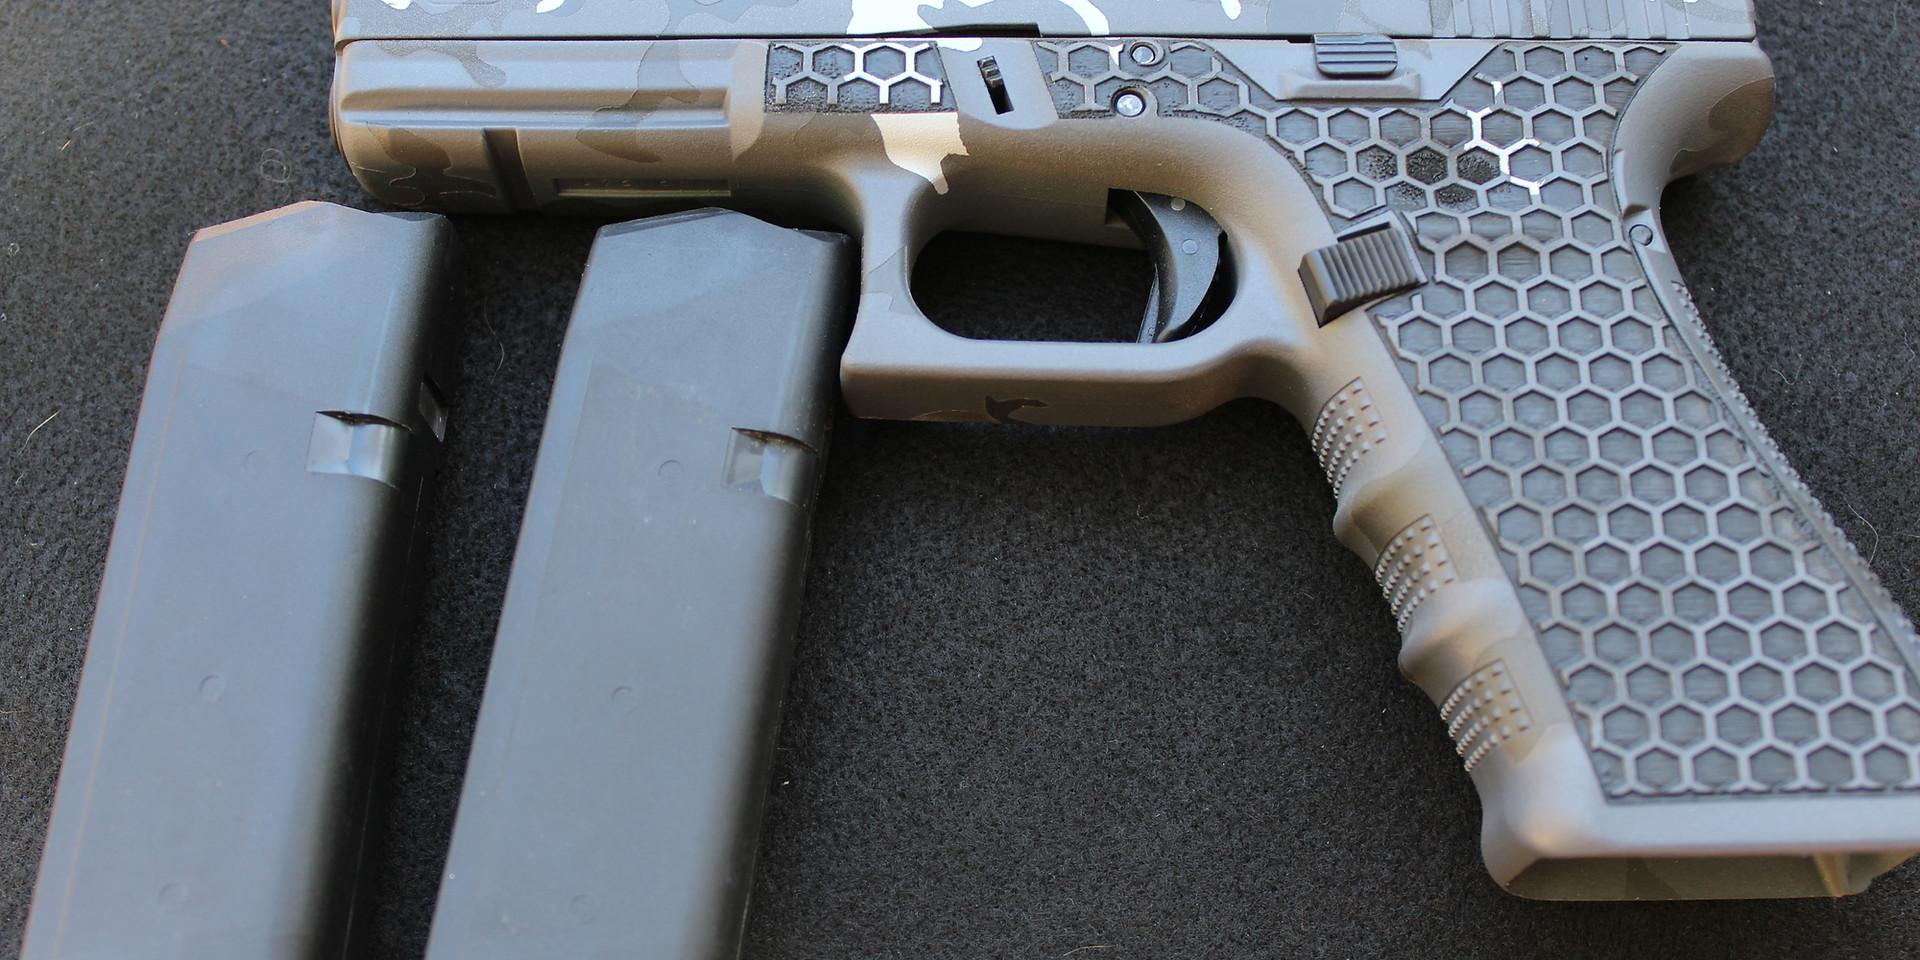 Grey Cammo on the Glock 17 Gen 4